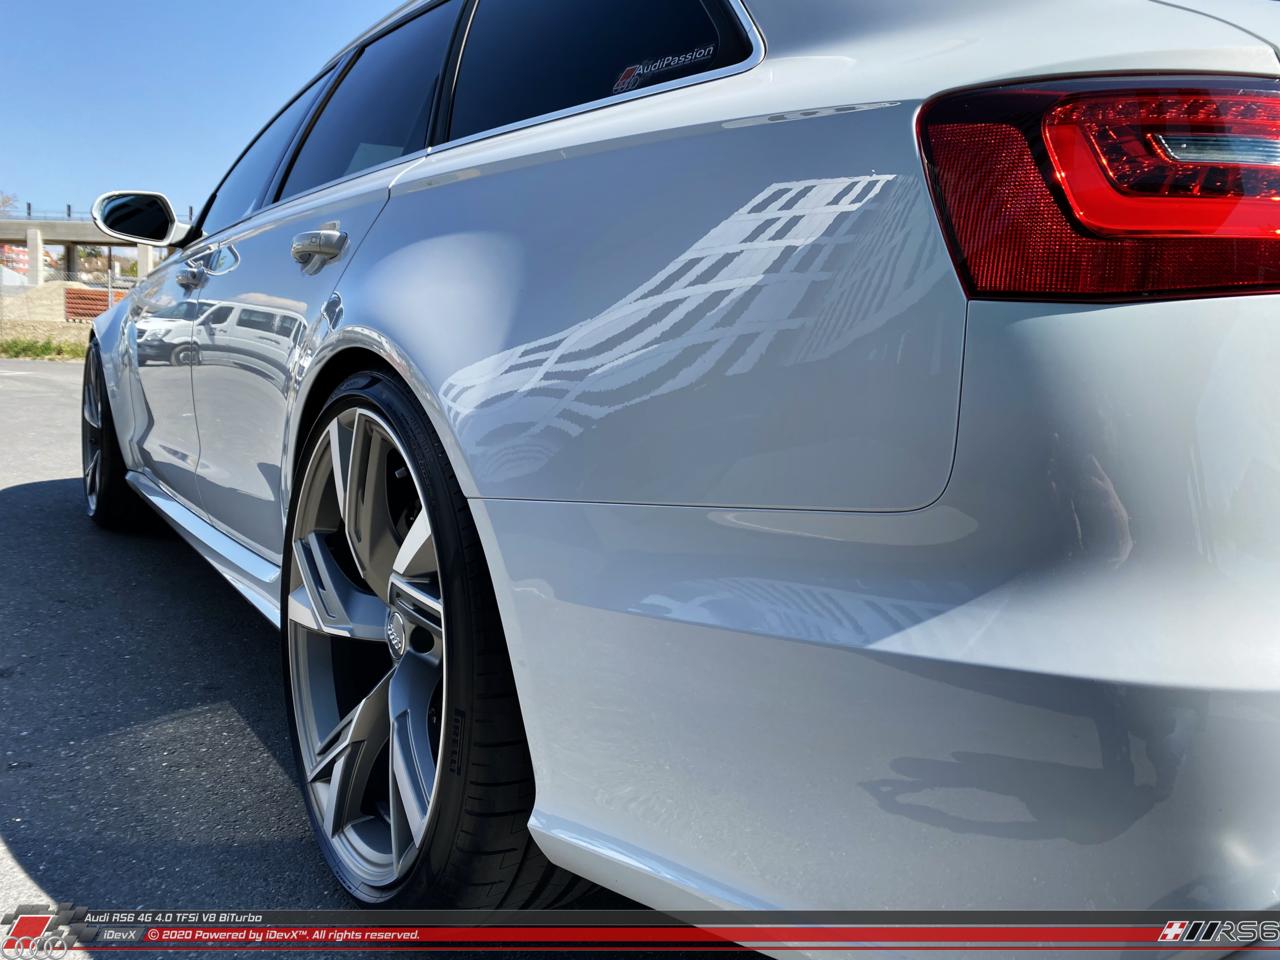 24.04.2020_Audi-RS6_iDevX_017.png